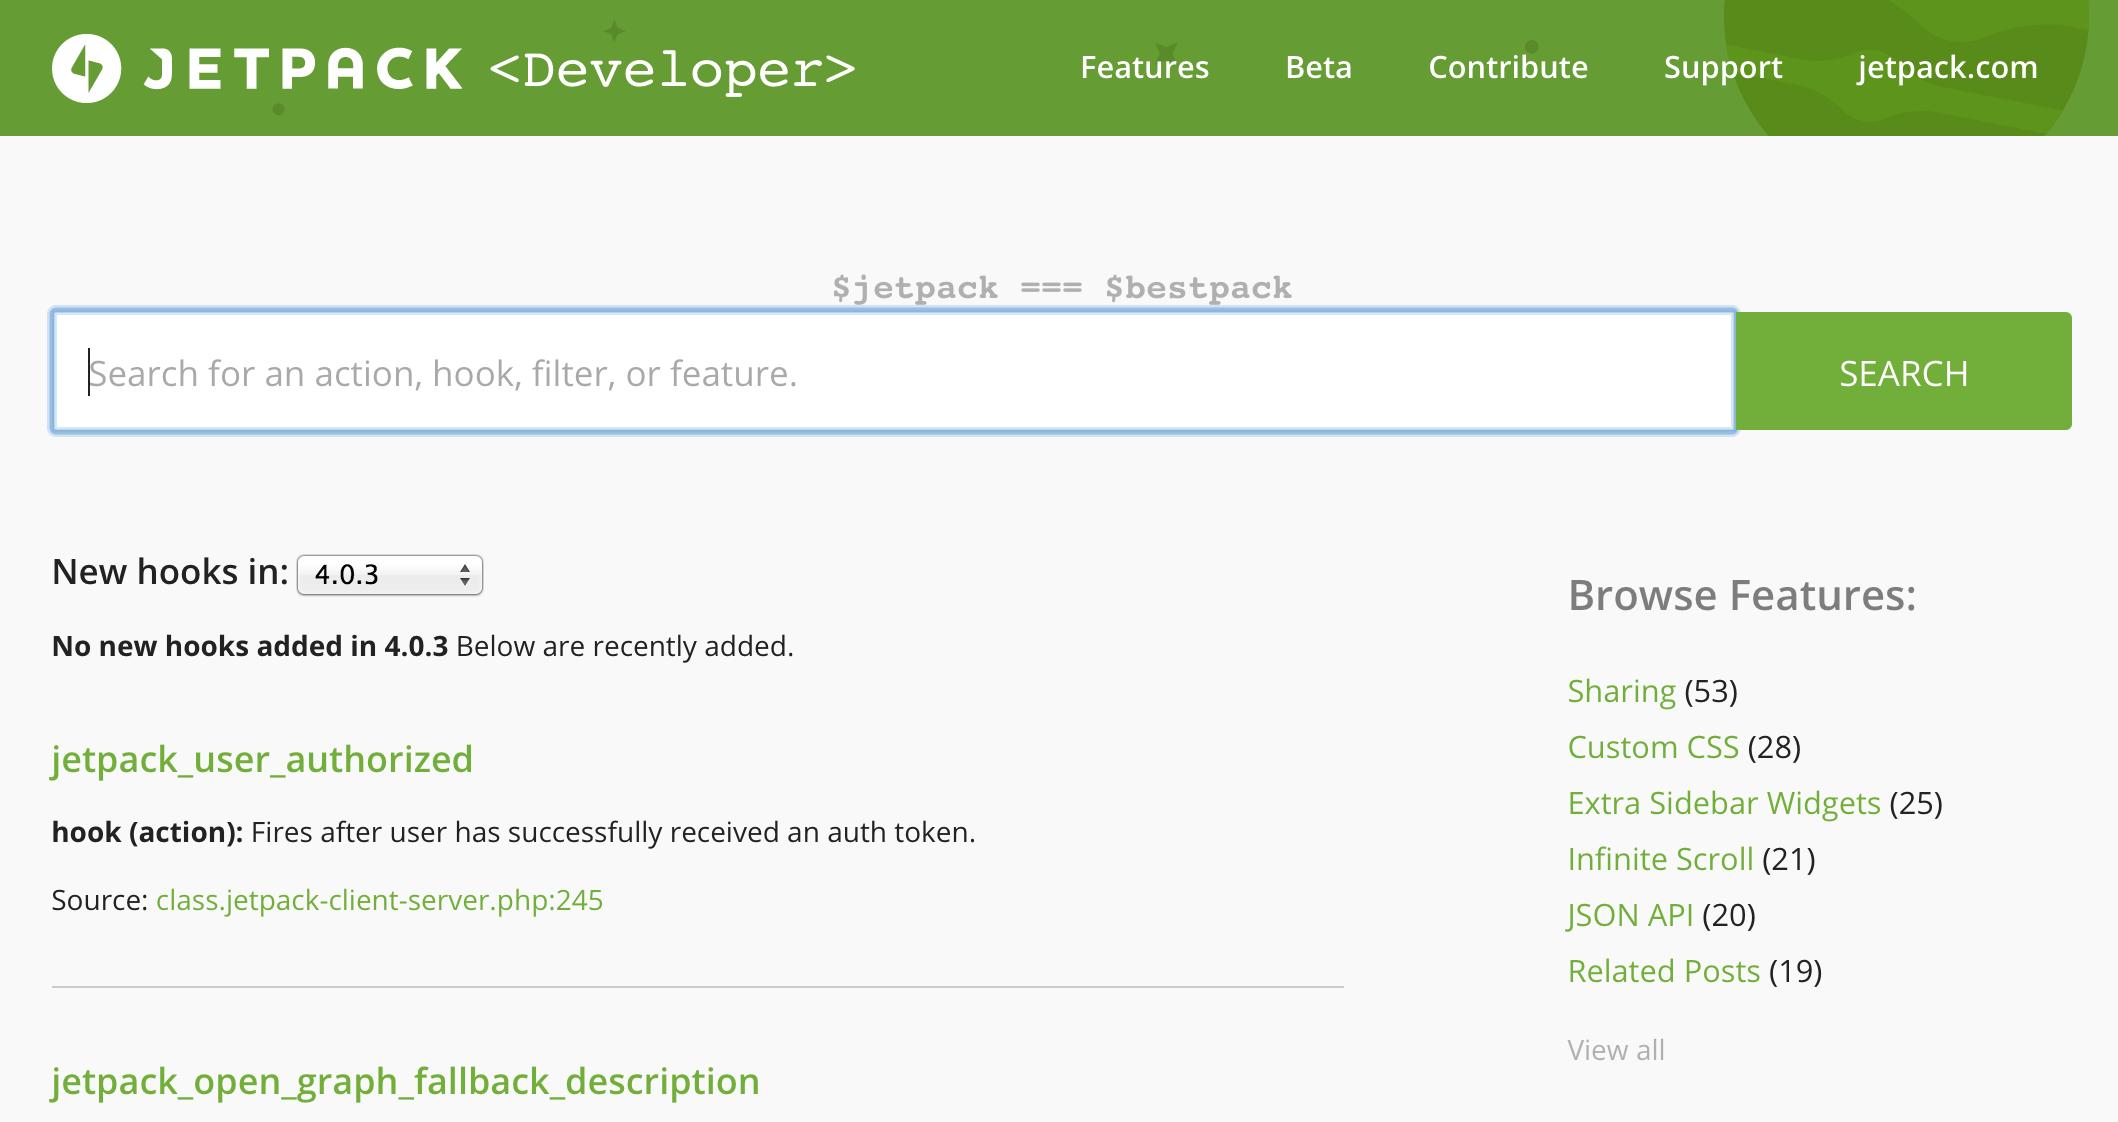 jetpack-developer